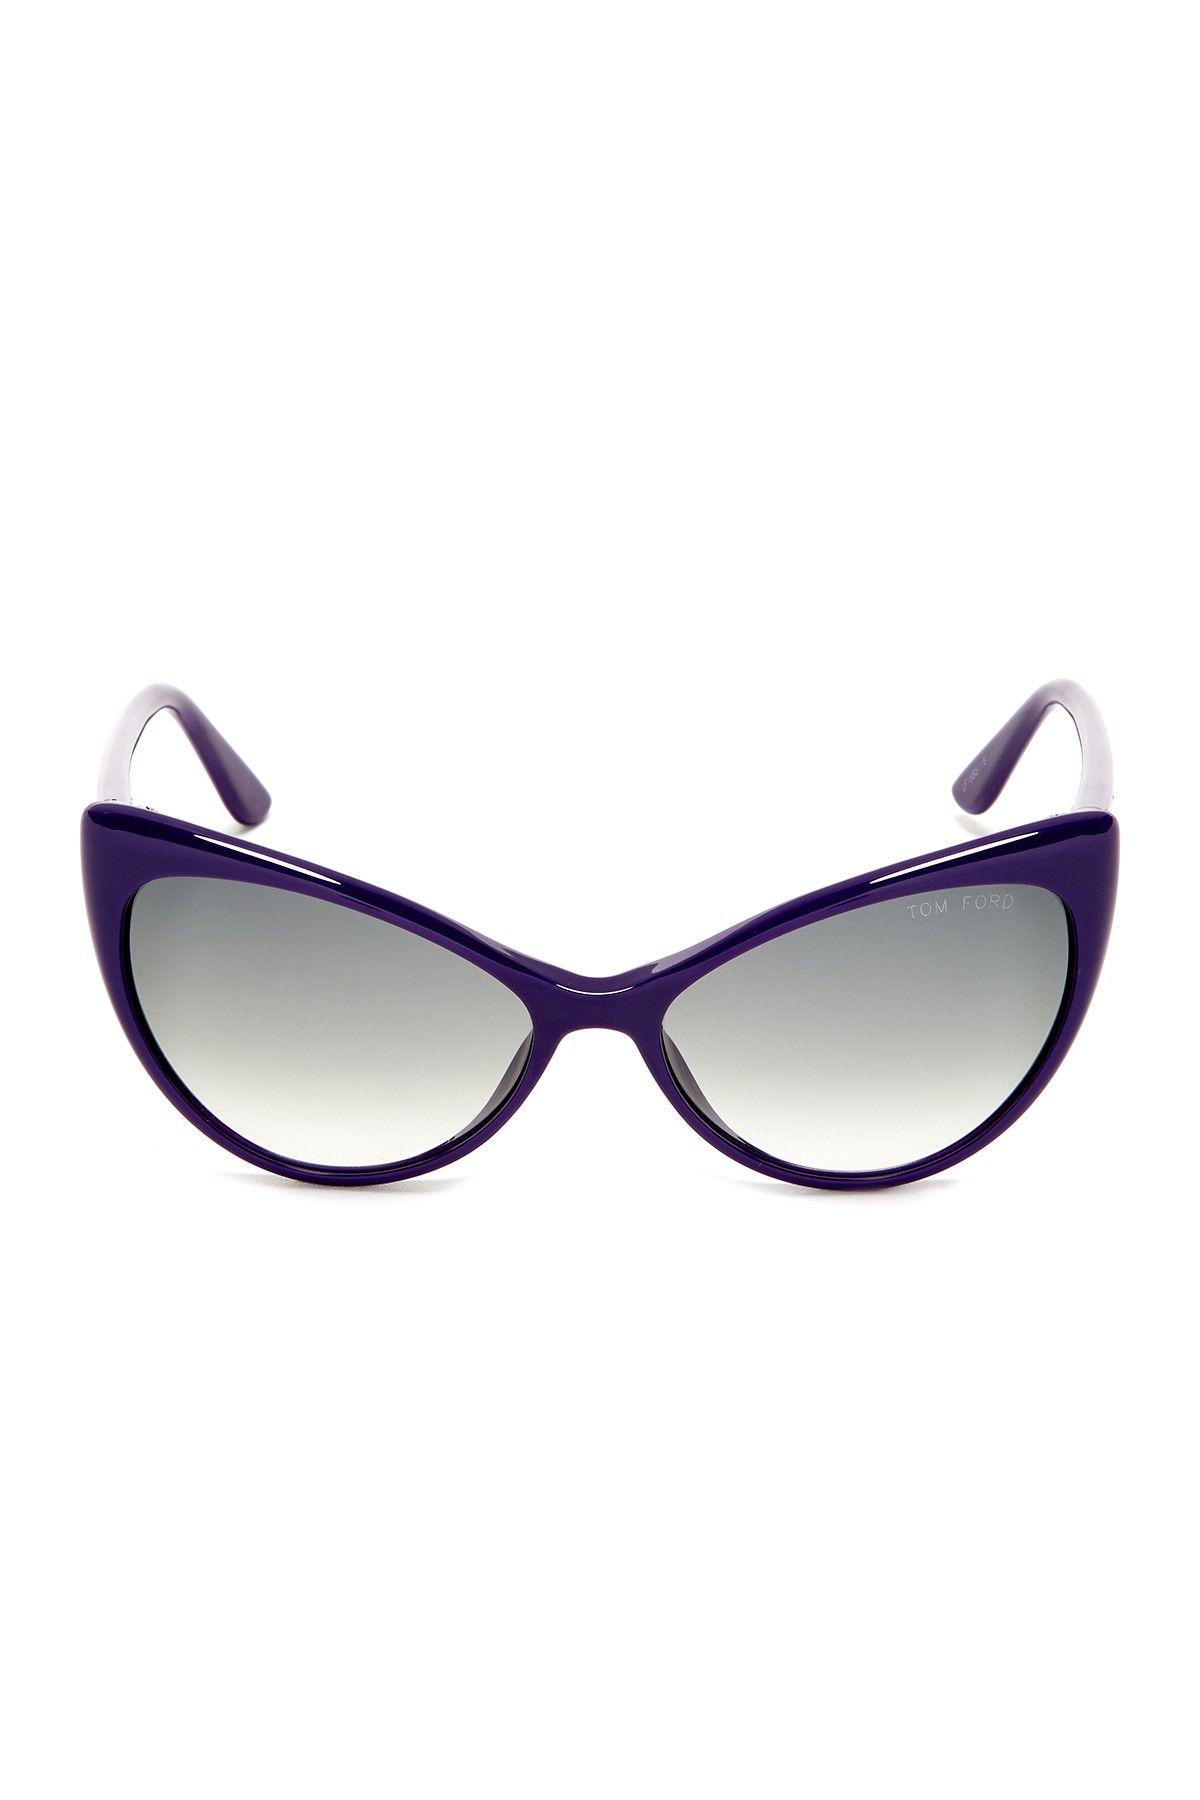 Tom Ford   Women s Anastasia Cat Eye Sunglasses Venda De Óculos De Sol Ray  Ban, 52096915d9